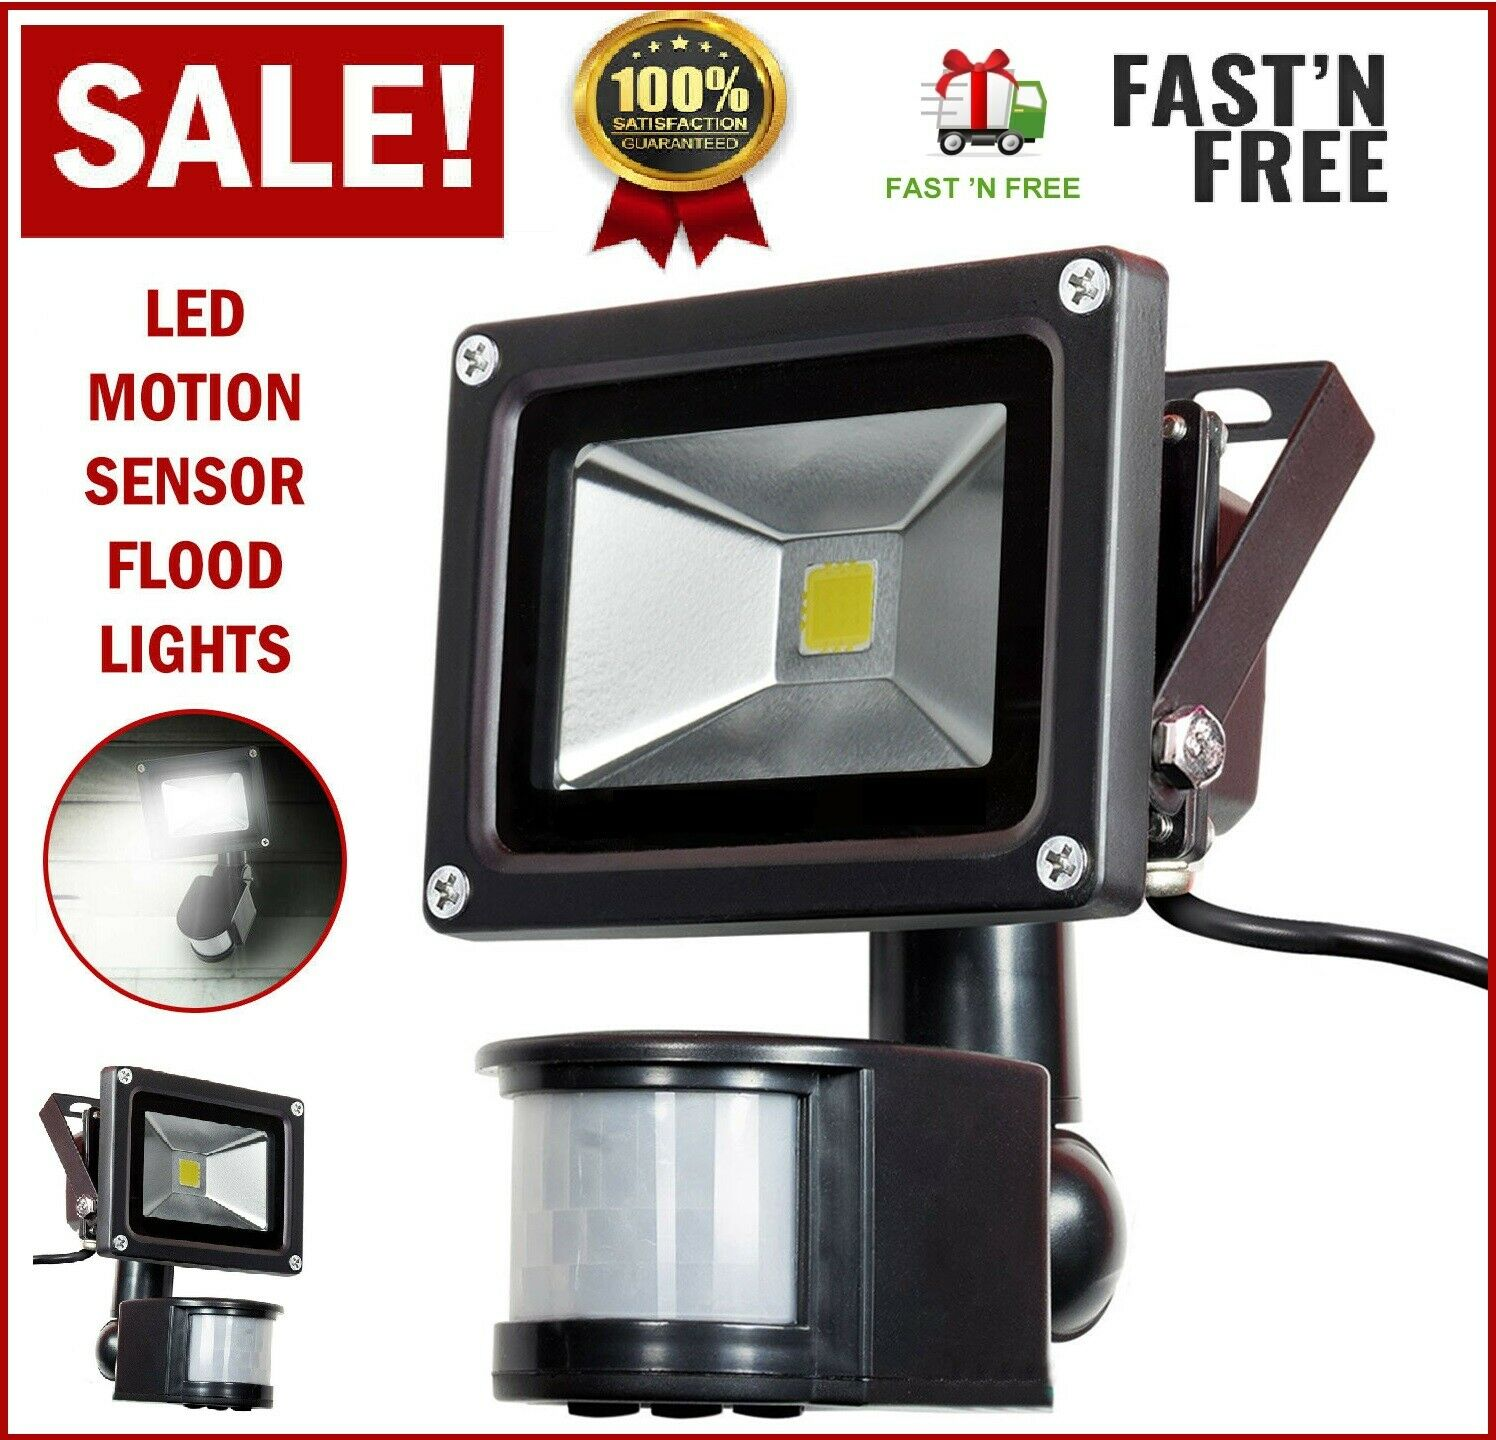 Motion Sensor Flood Light Waterproof Outdoor Security Light